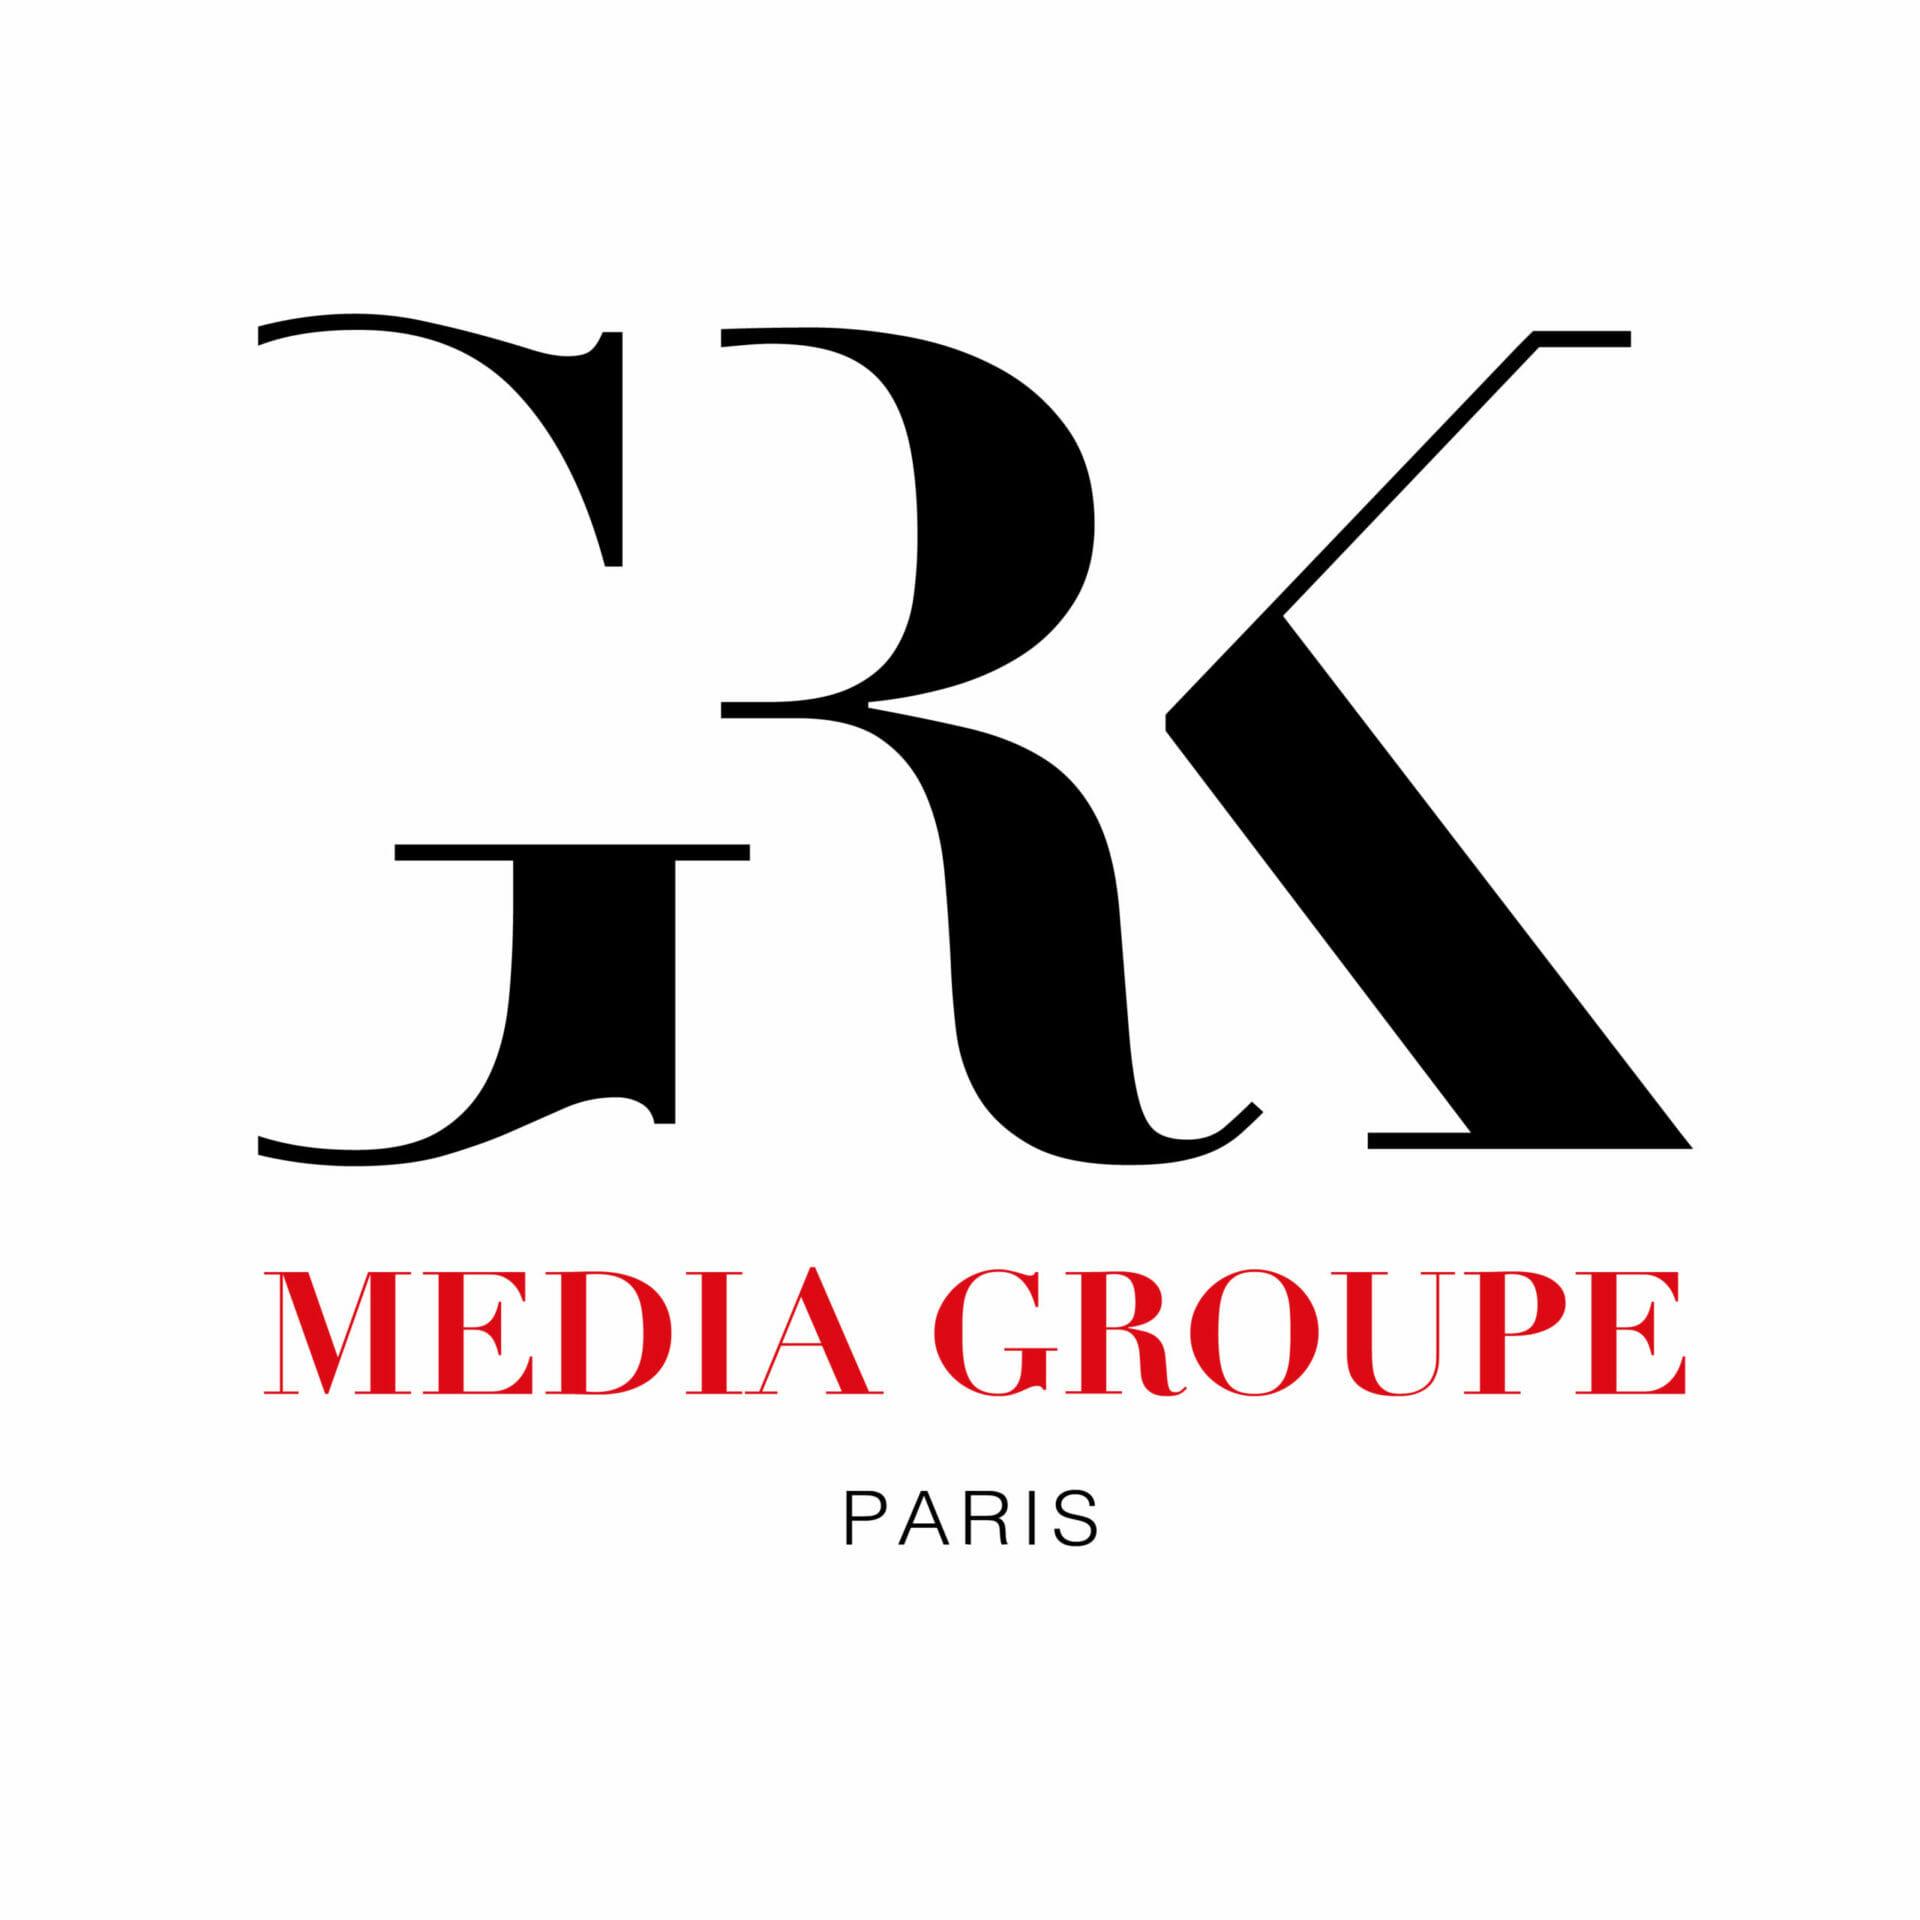 GRK media group